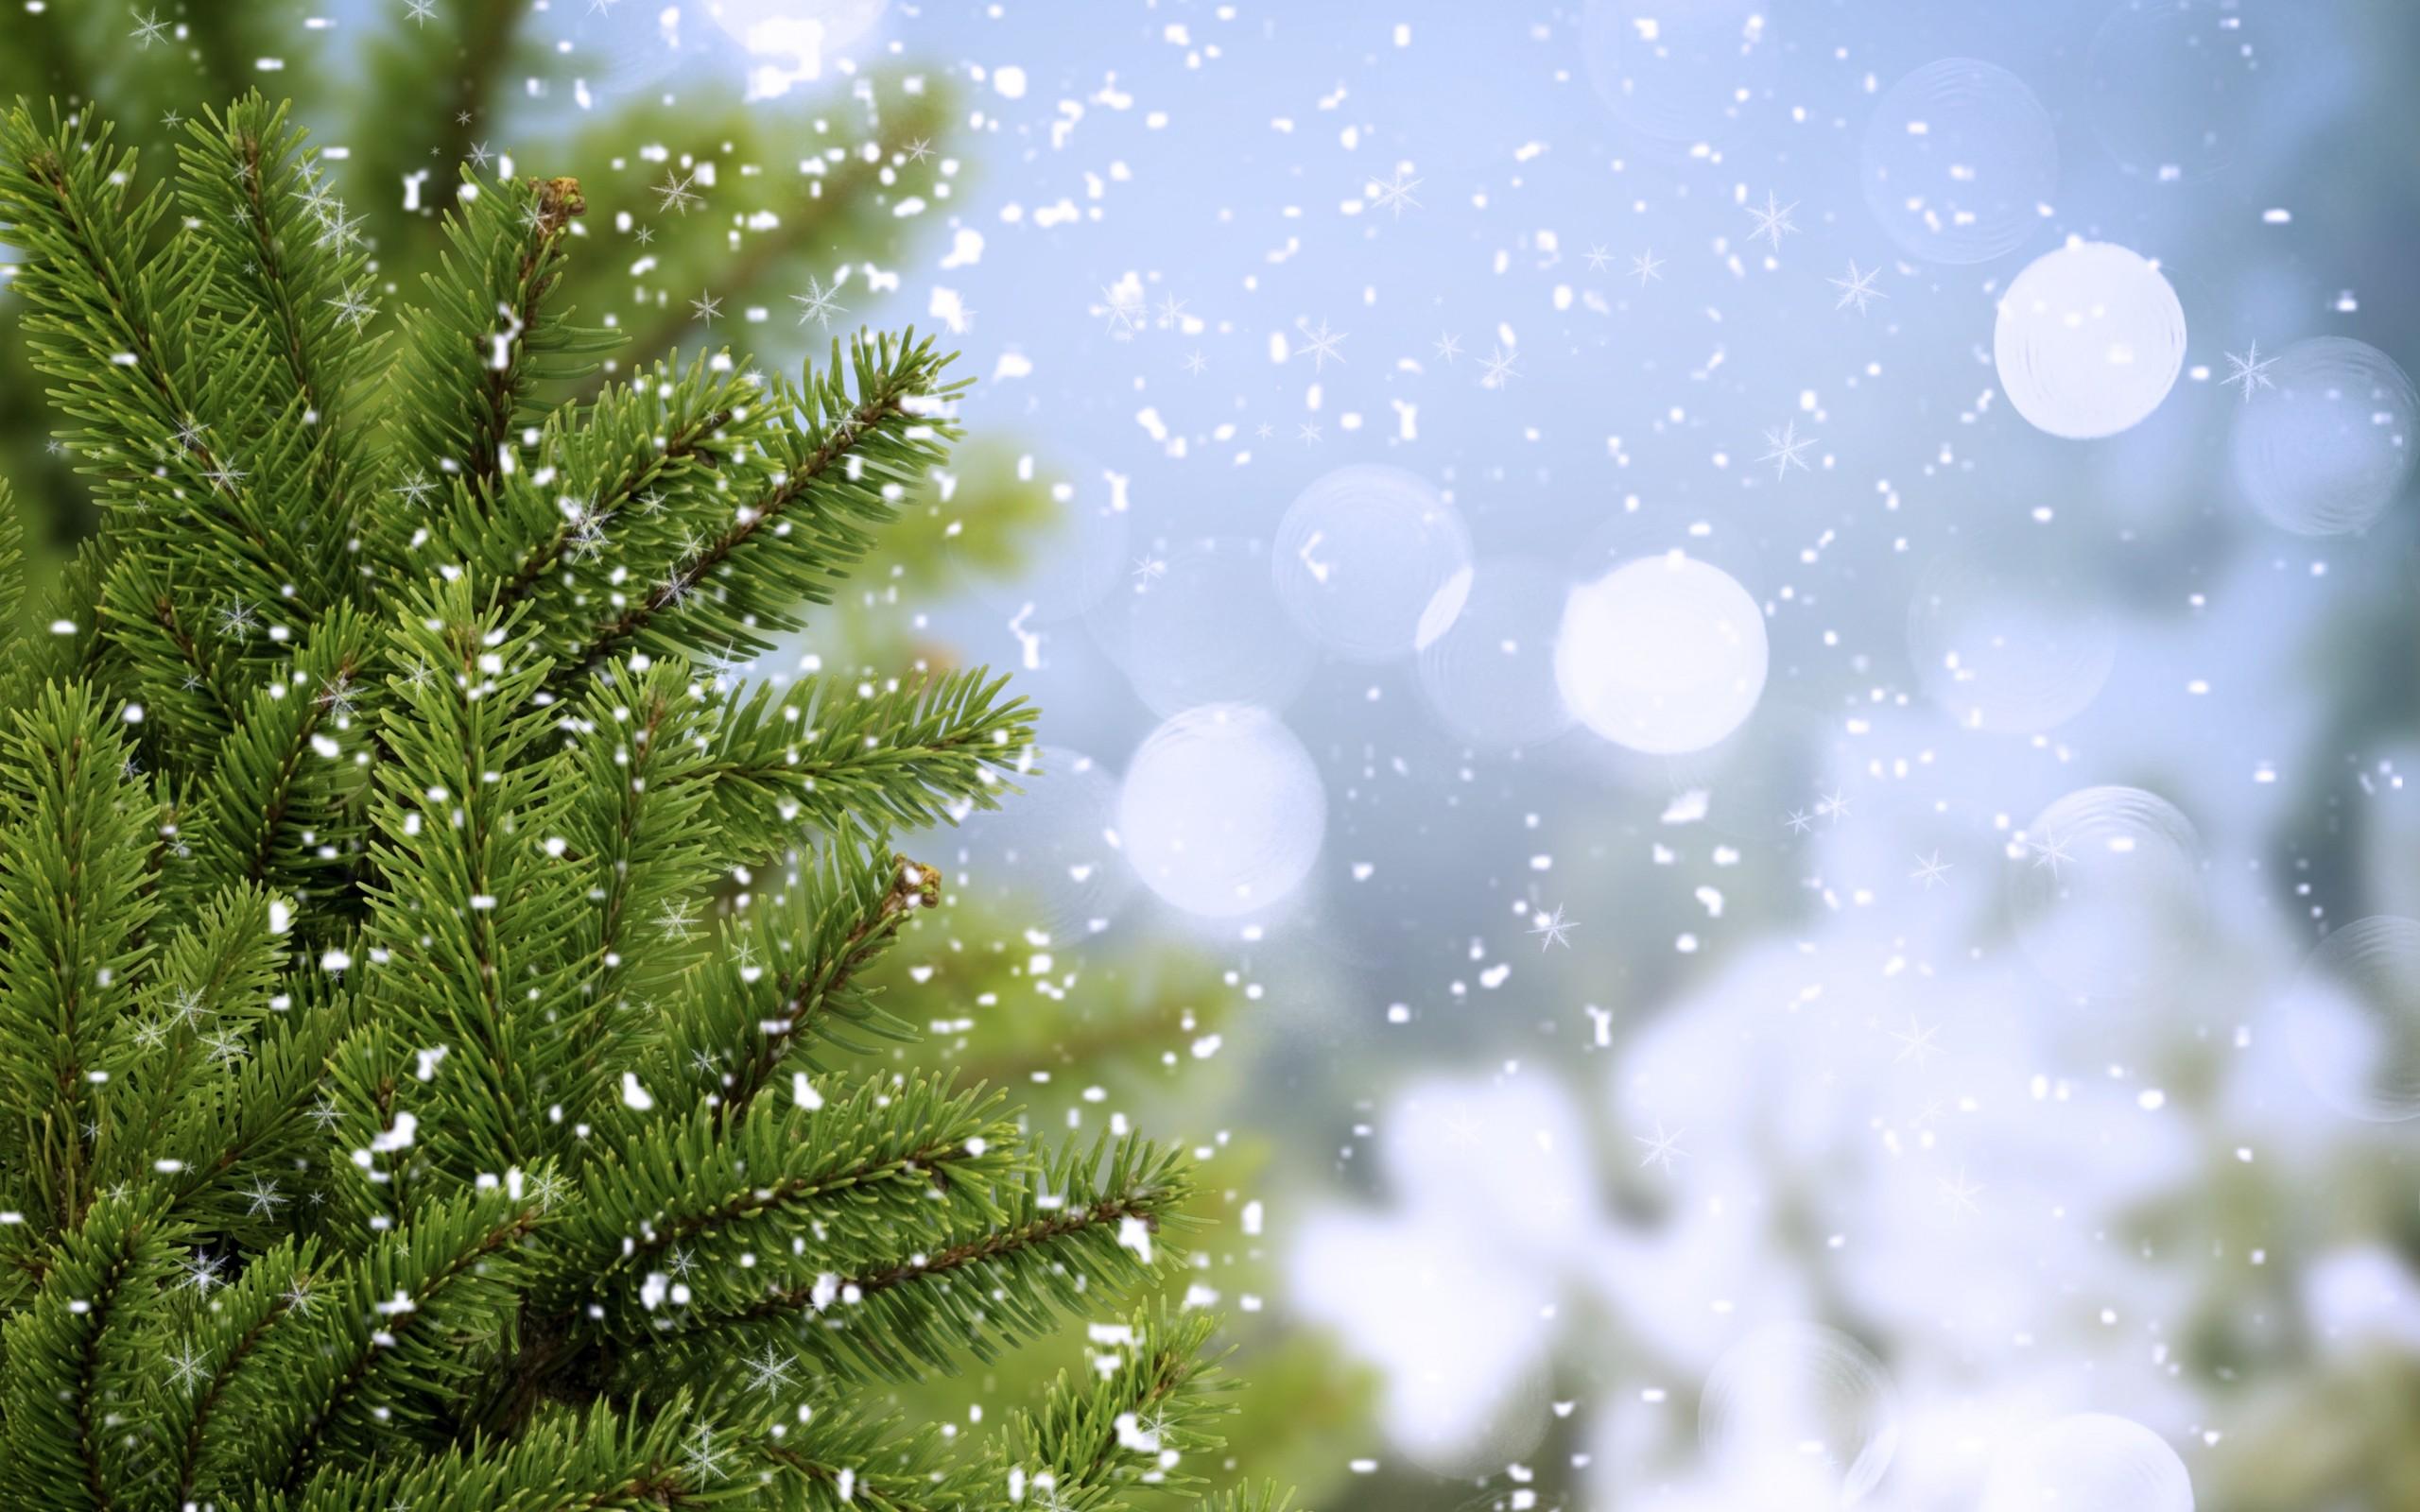 ель зима снег бесплатно